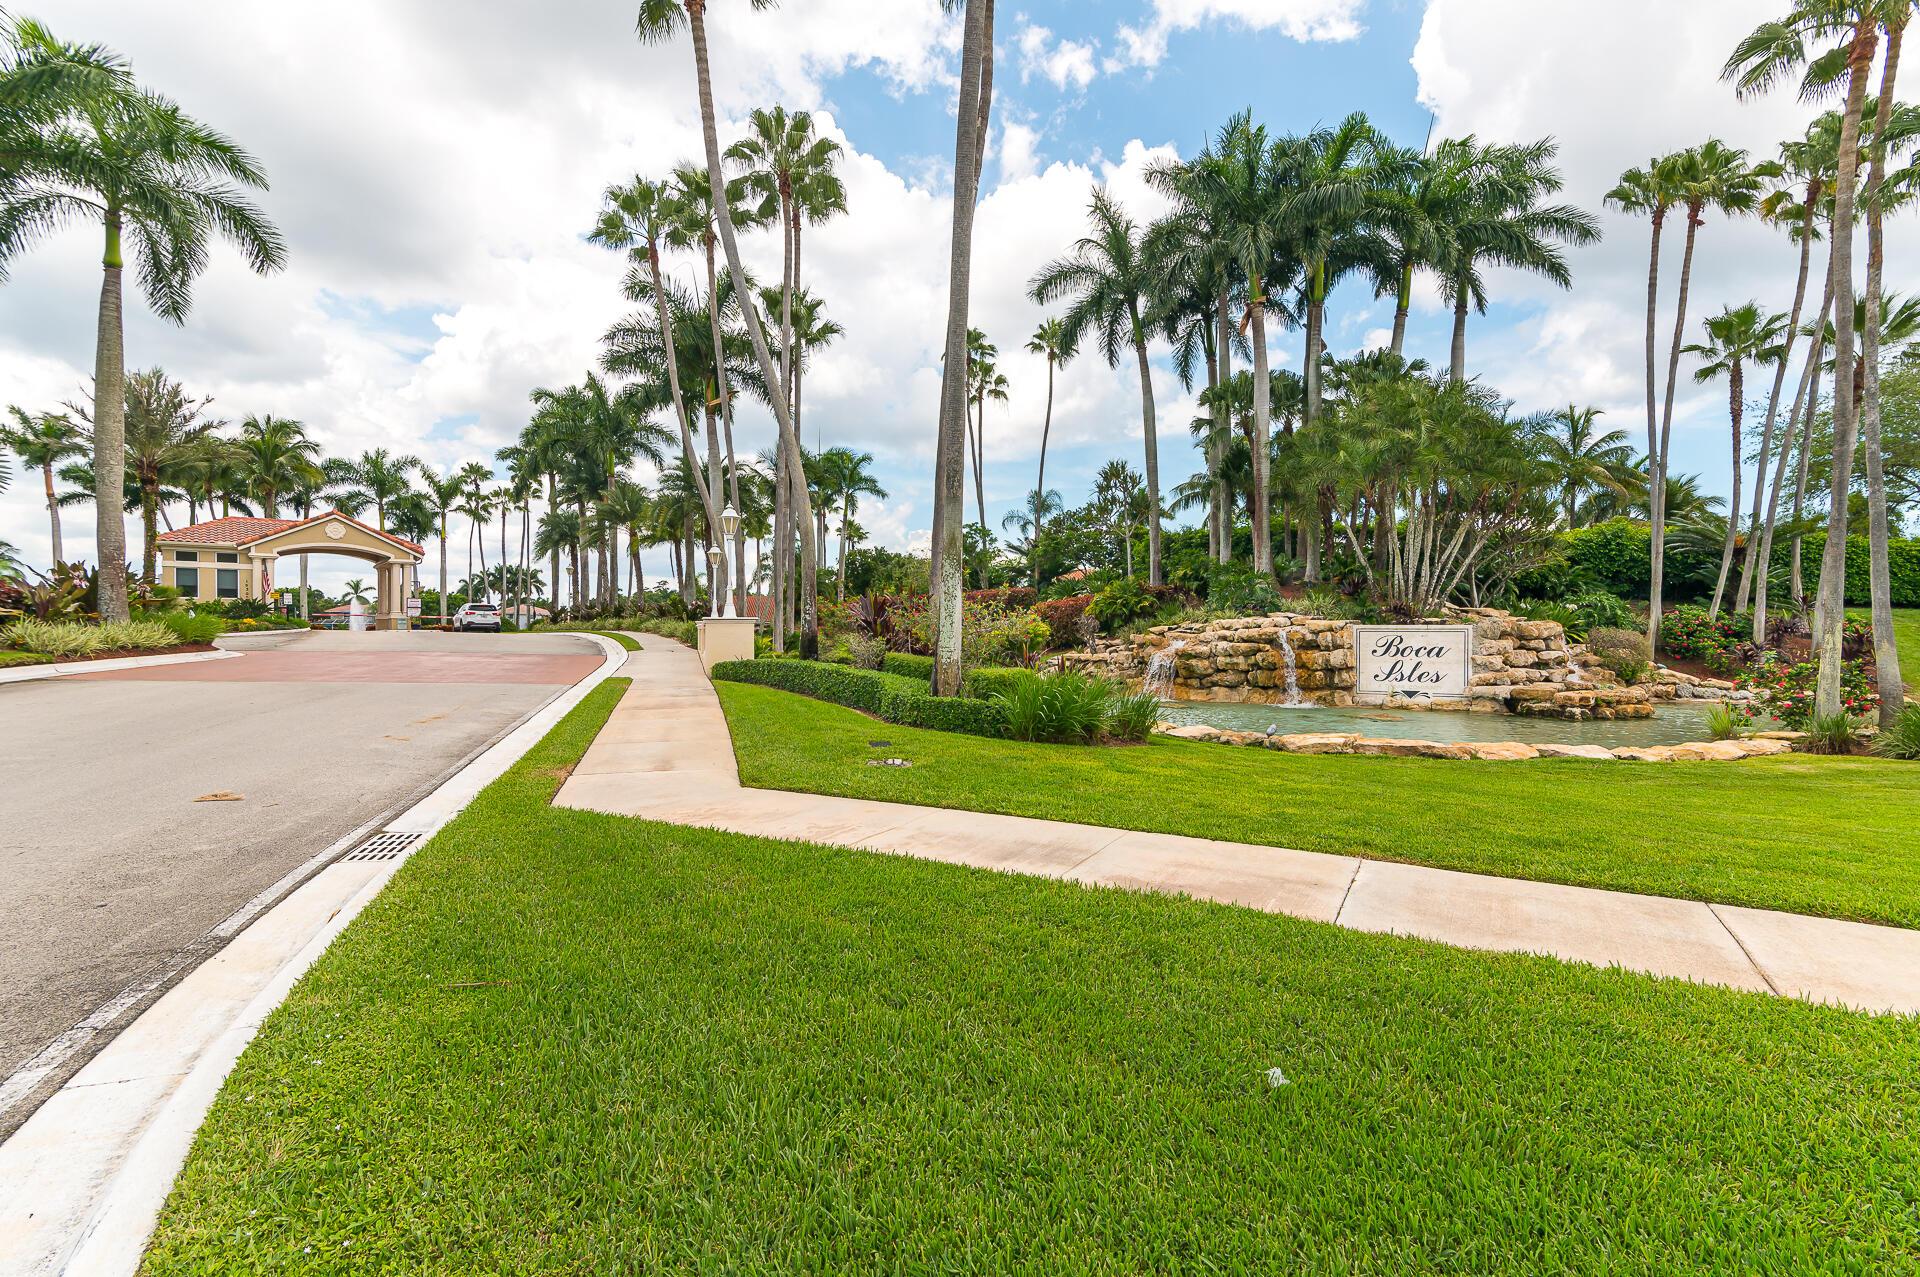 Photo of 10728 Maple Chase Drive, Boca Raton, FL 33498